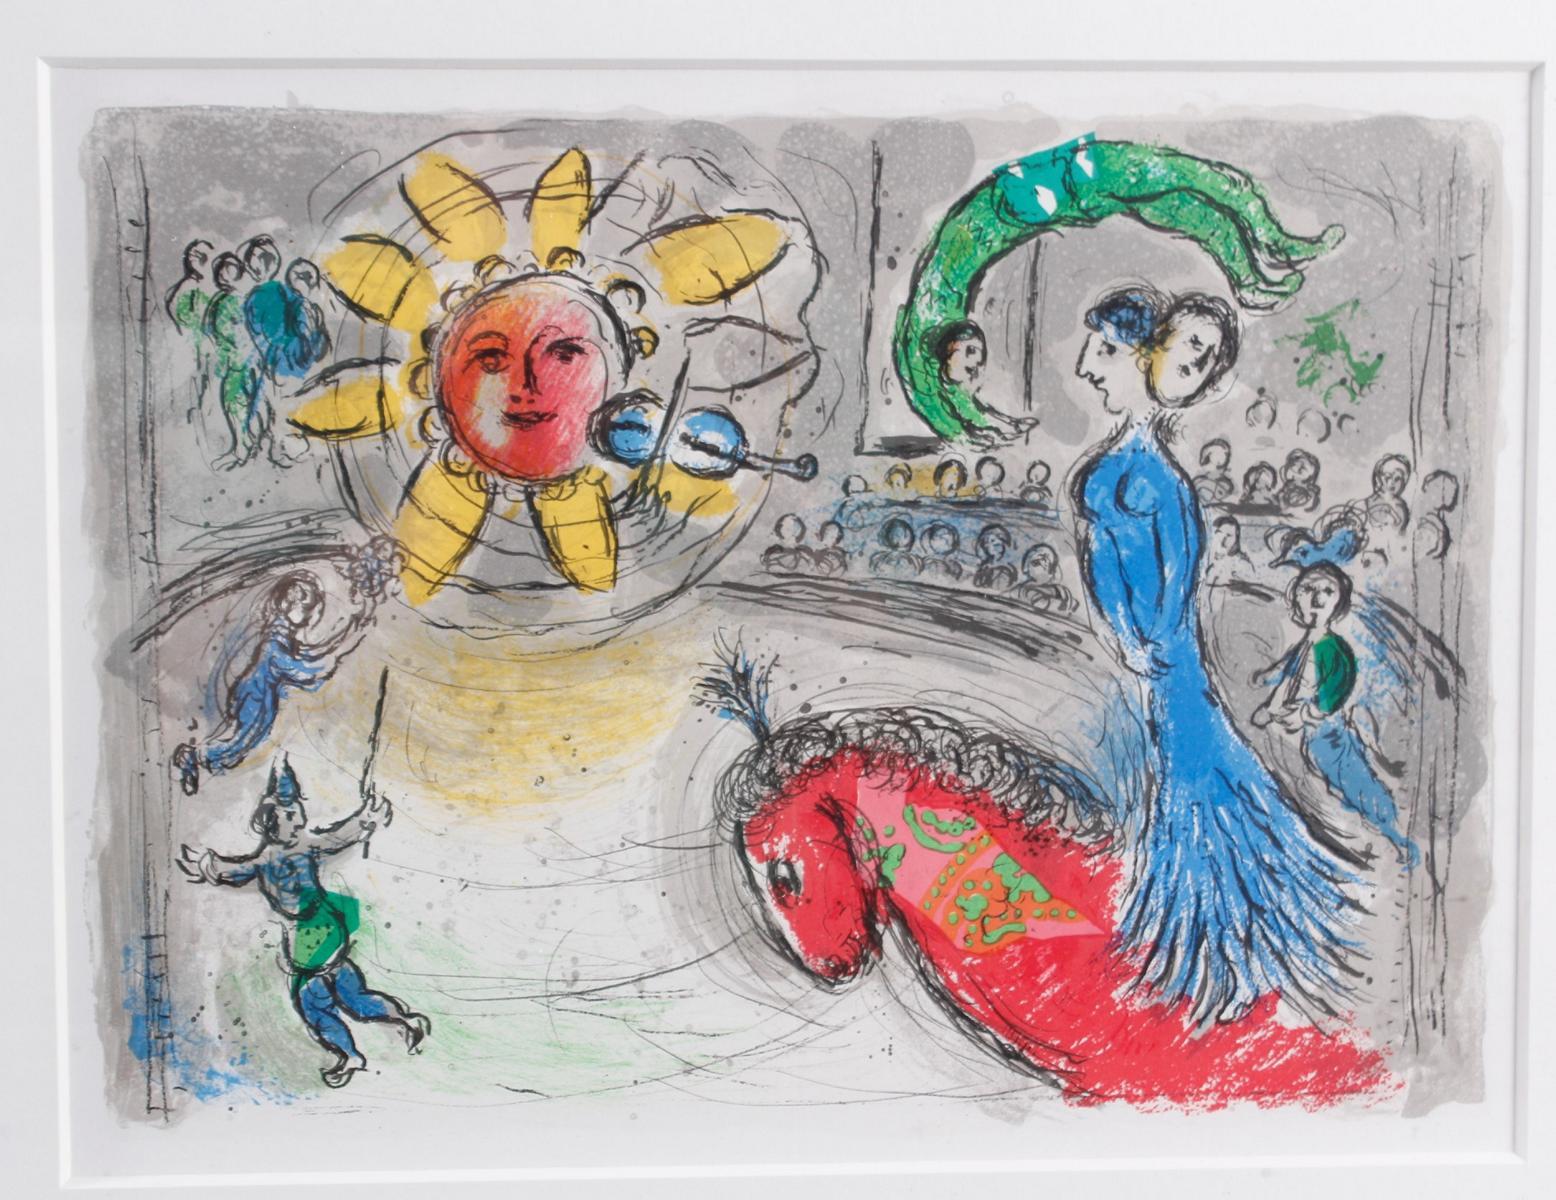 Chagall, Marc 1887 – 1985-2